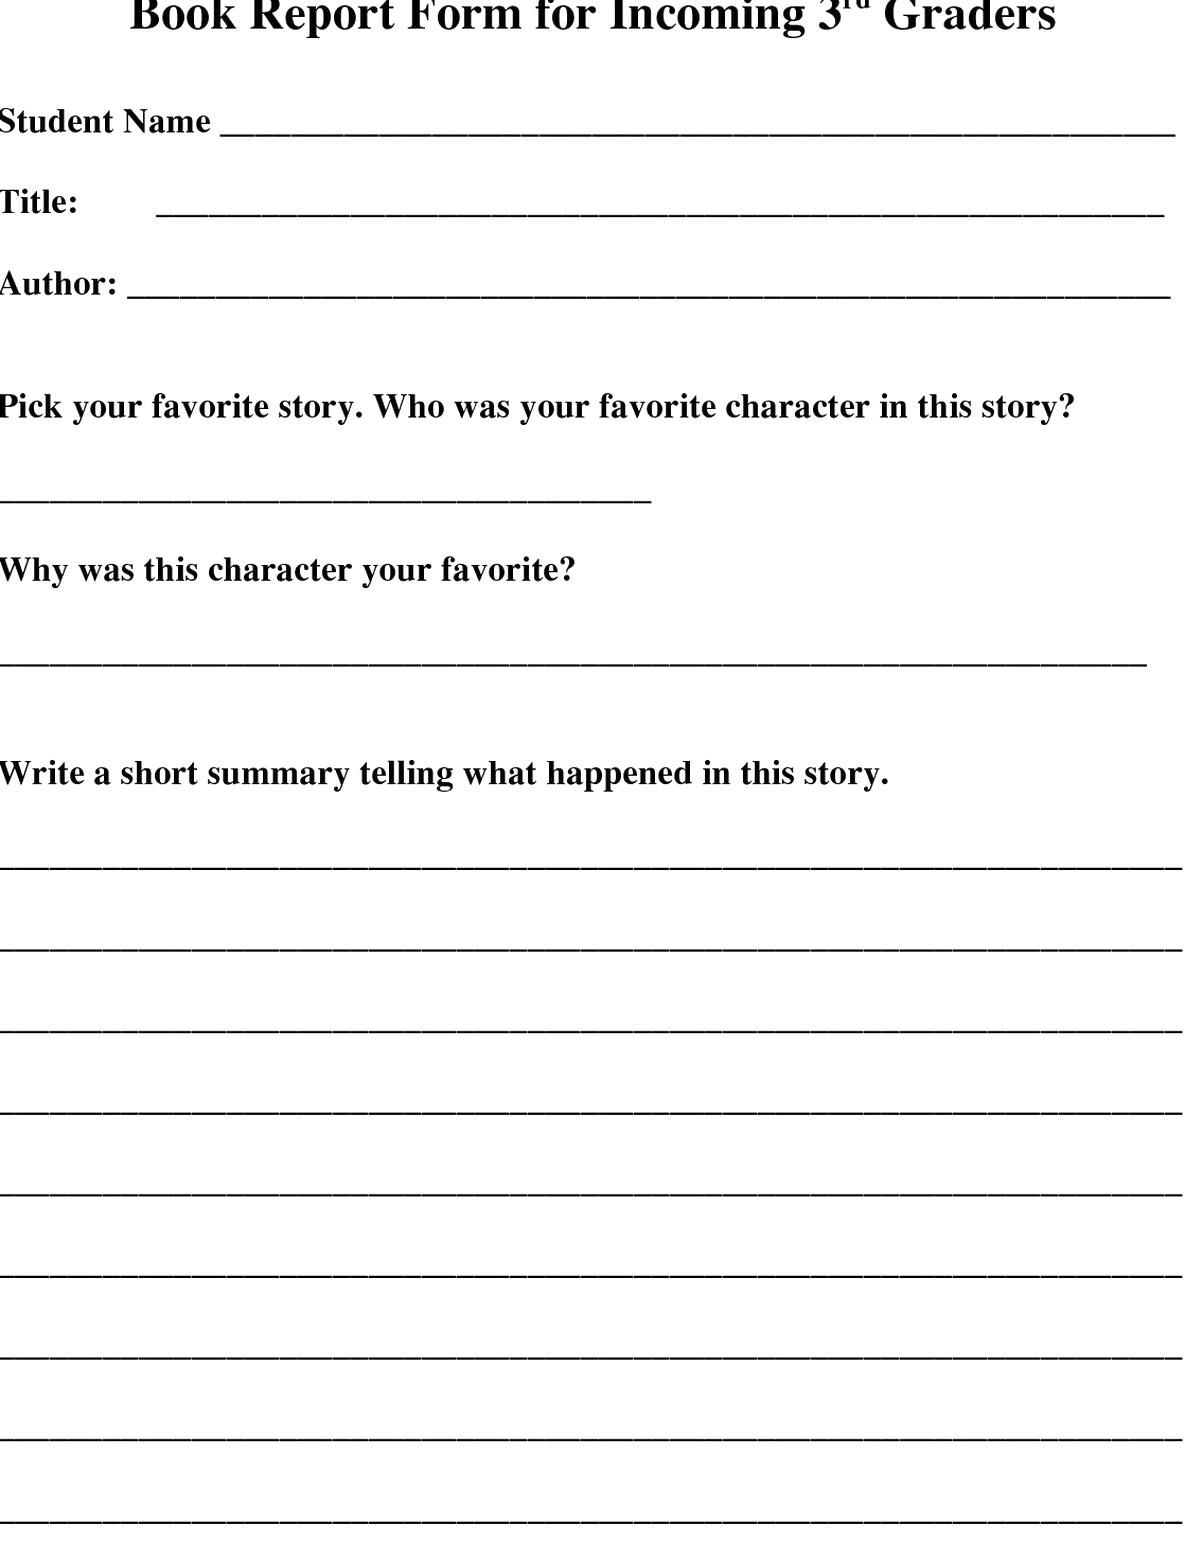 Grade 6 Book Report Template